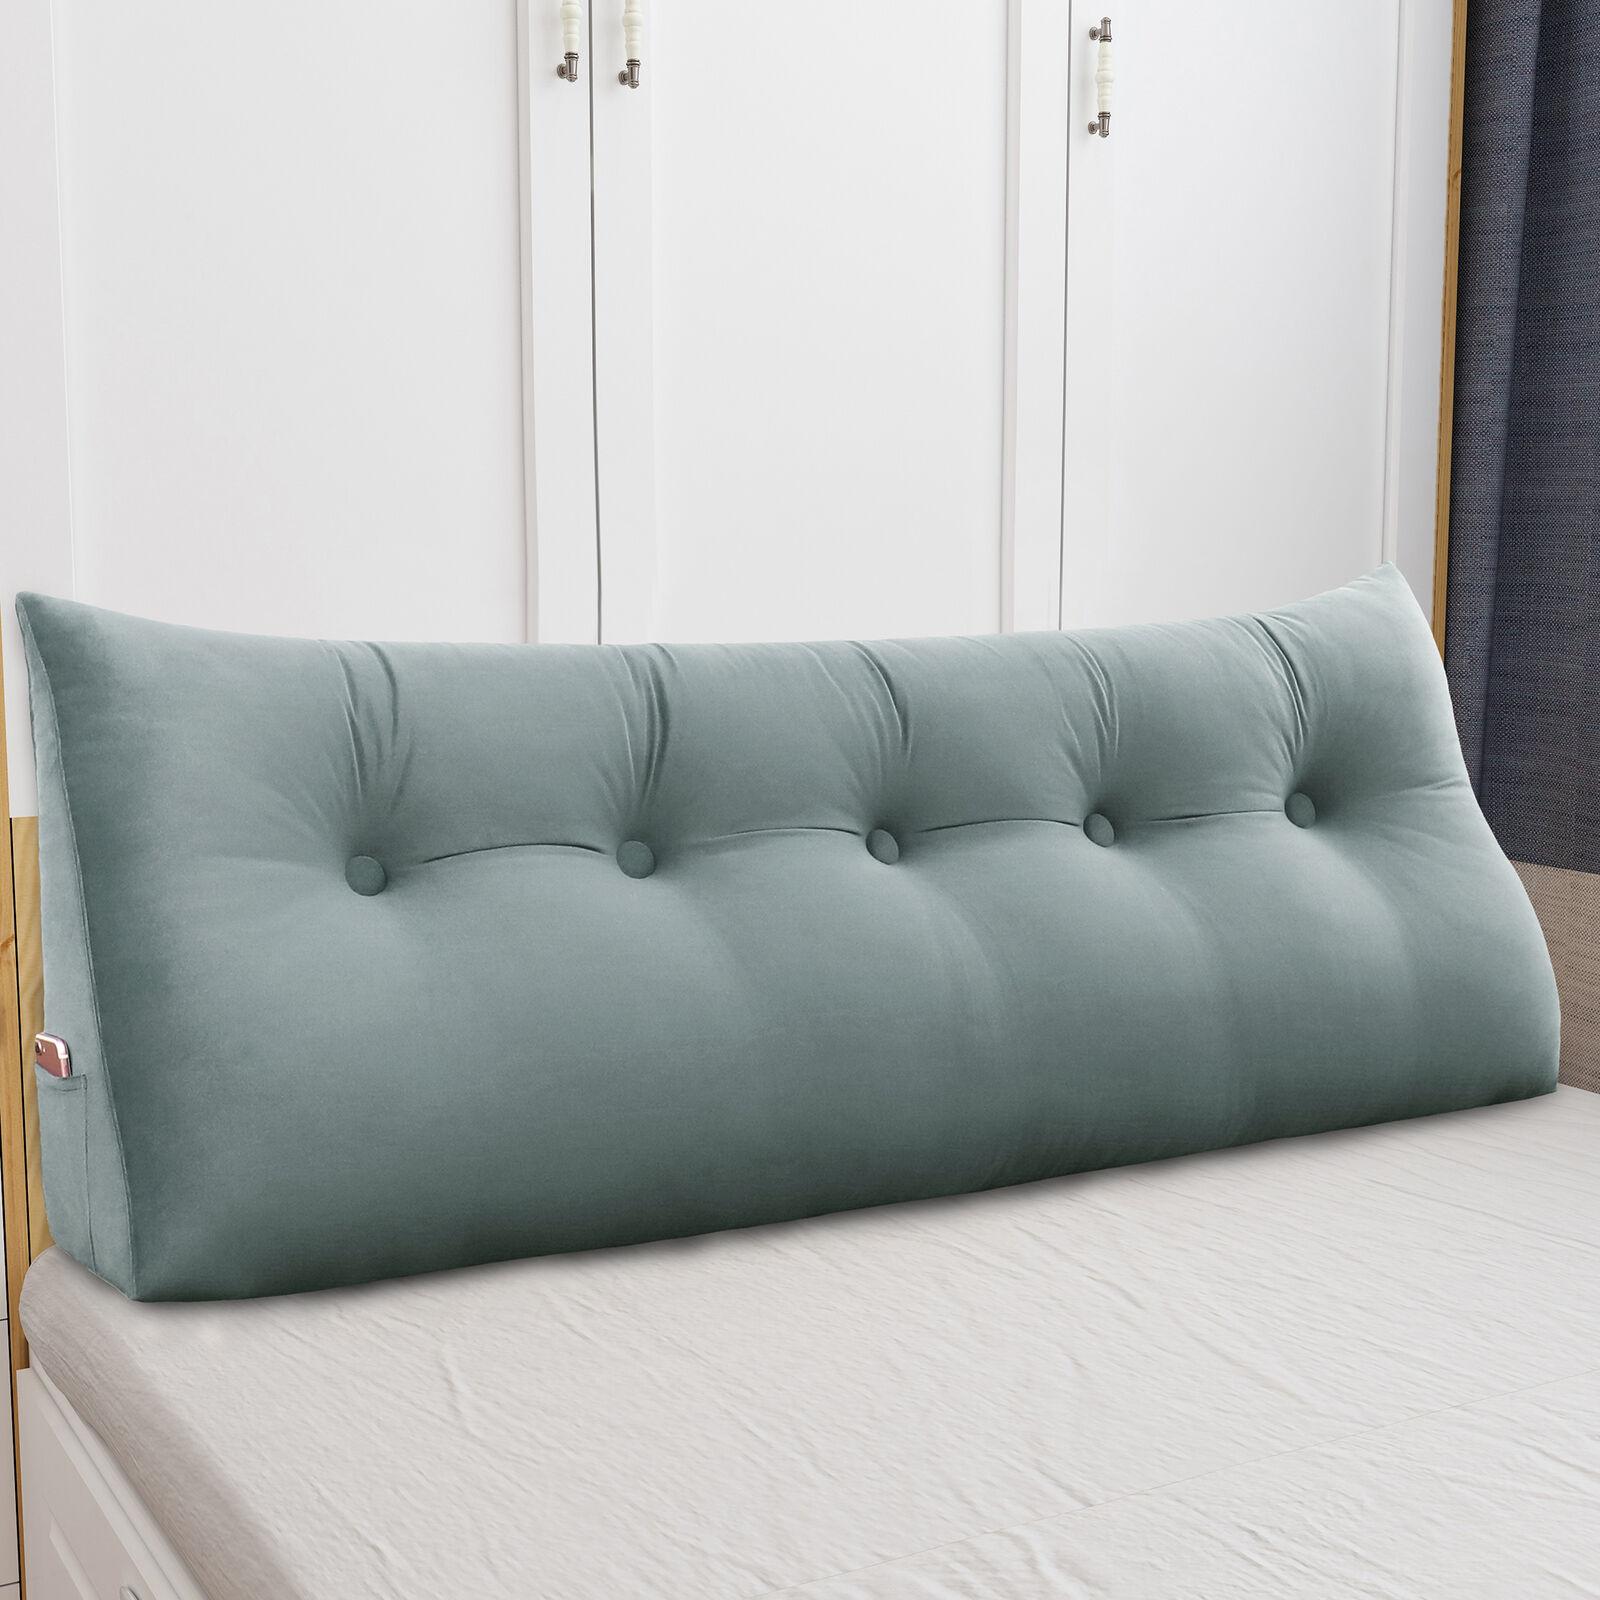 - Daybed Bolster Pillow Headboard Triangular Wedge Cushion Backrest